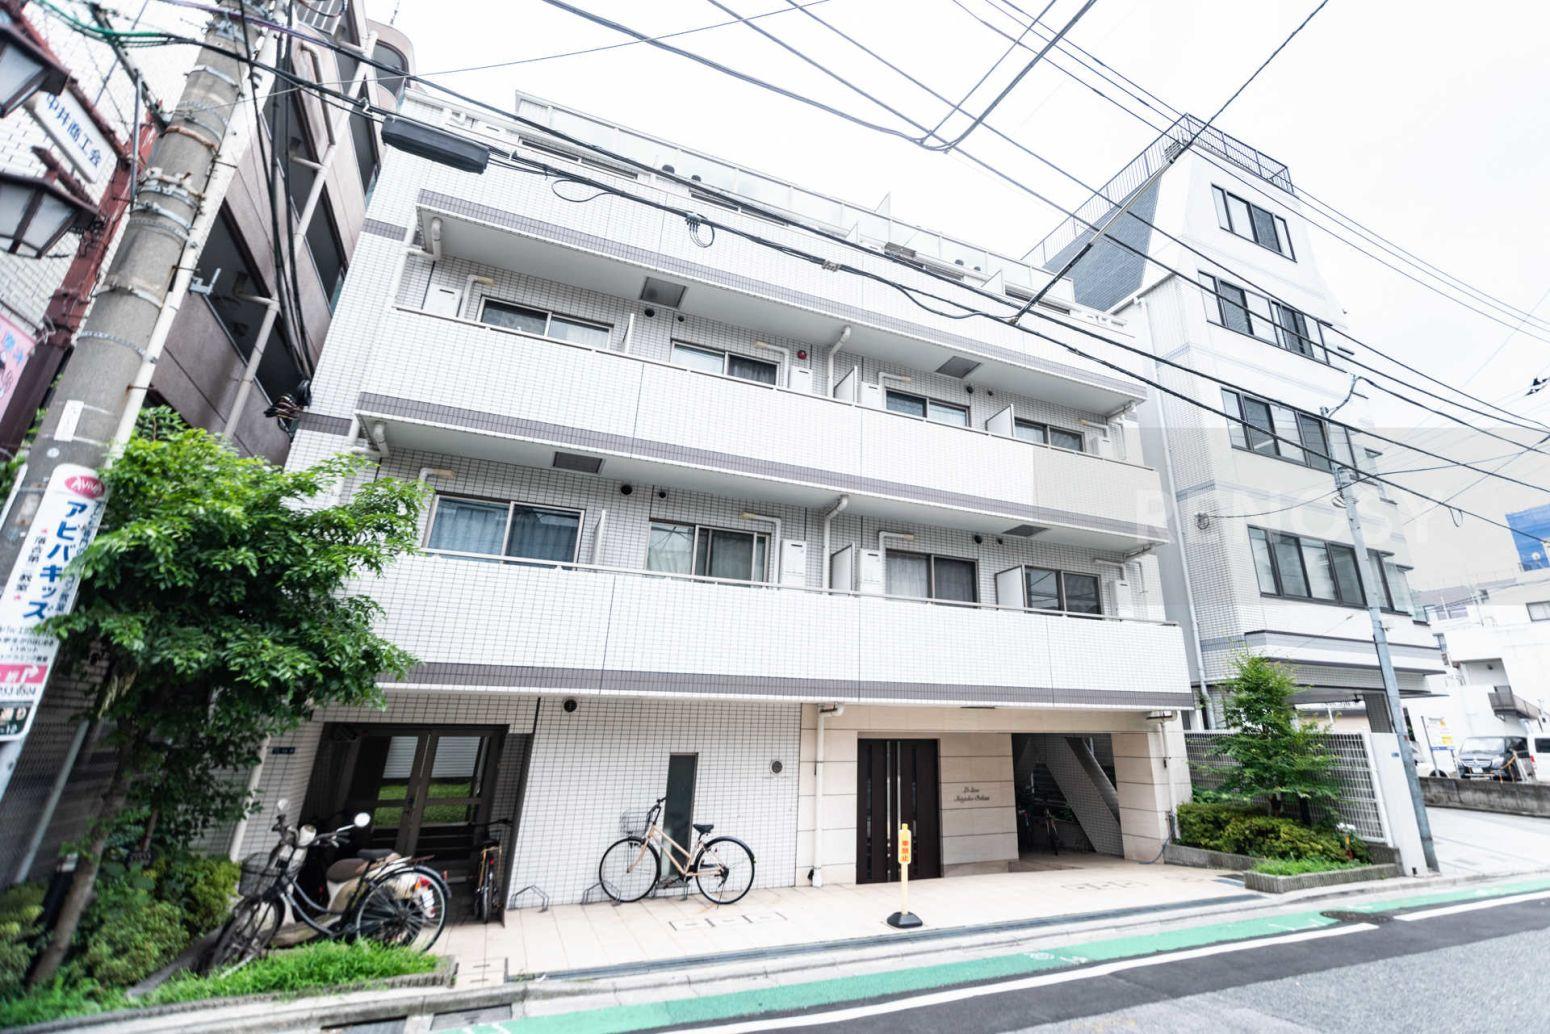 Le-lion Shinjuku-Ochiai